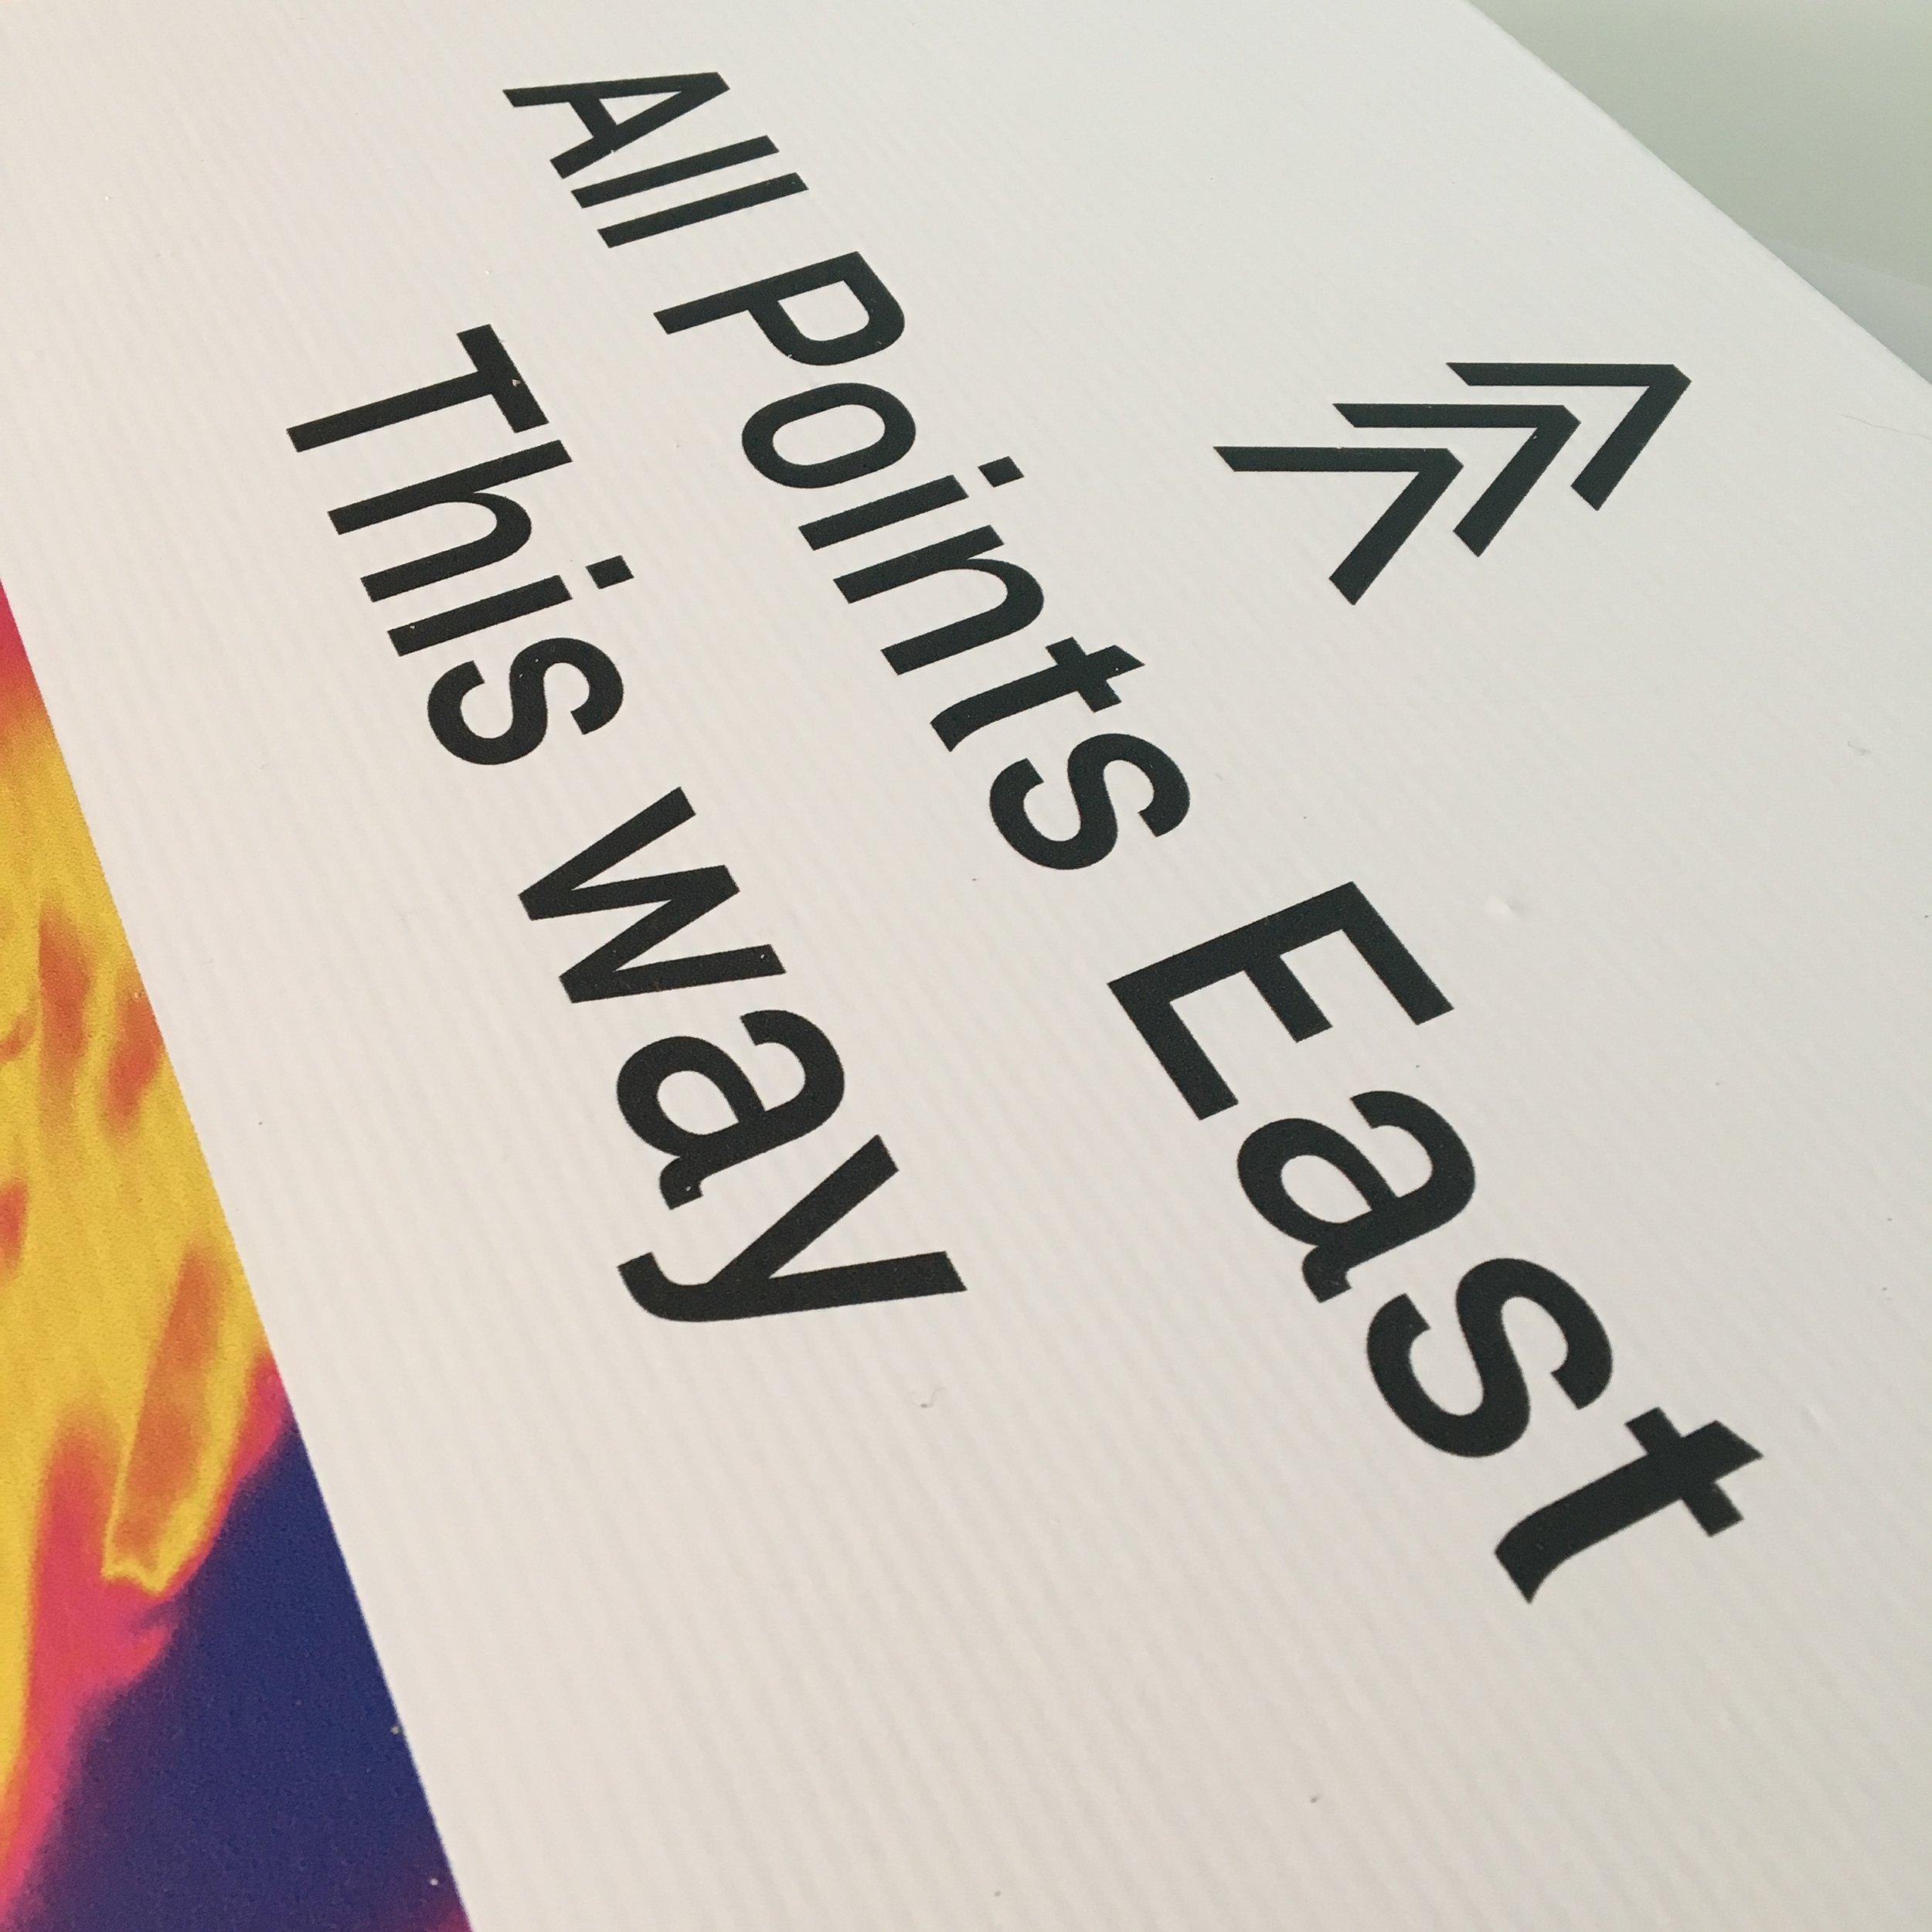 Exhibition & event signage -